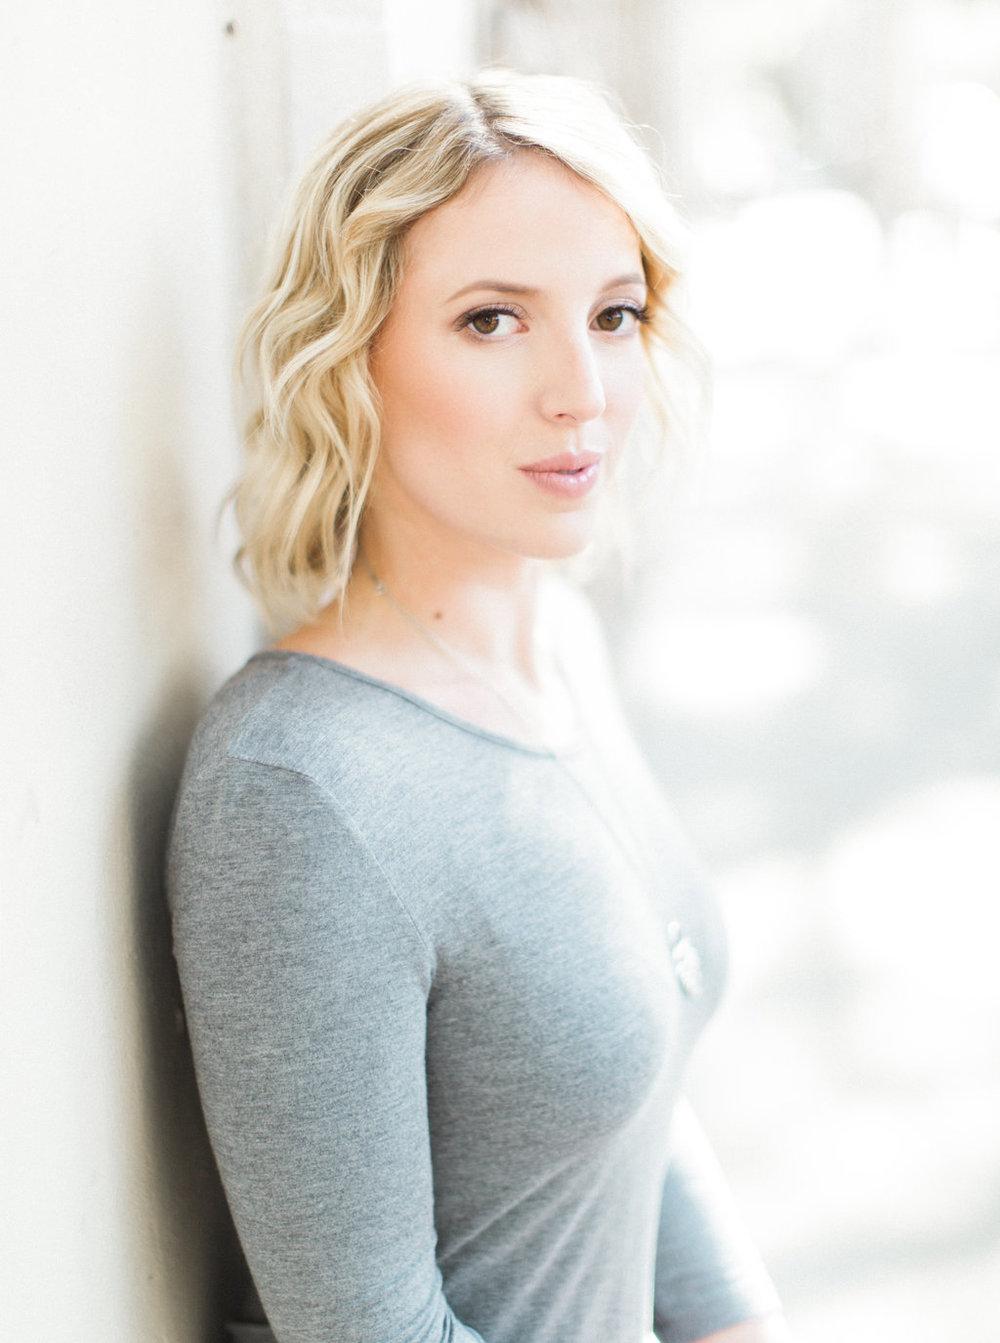 Photo by Kelsea Holder, Beauty by Amanda Olson